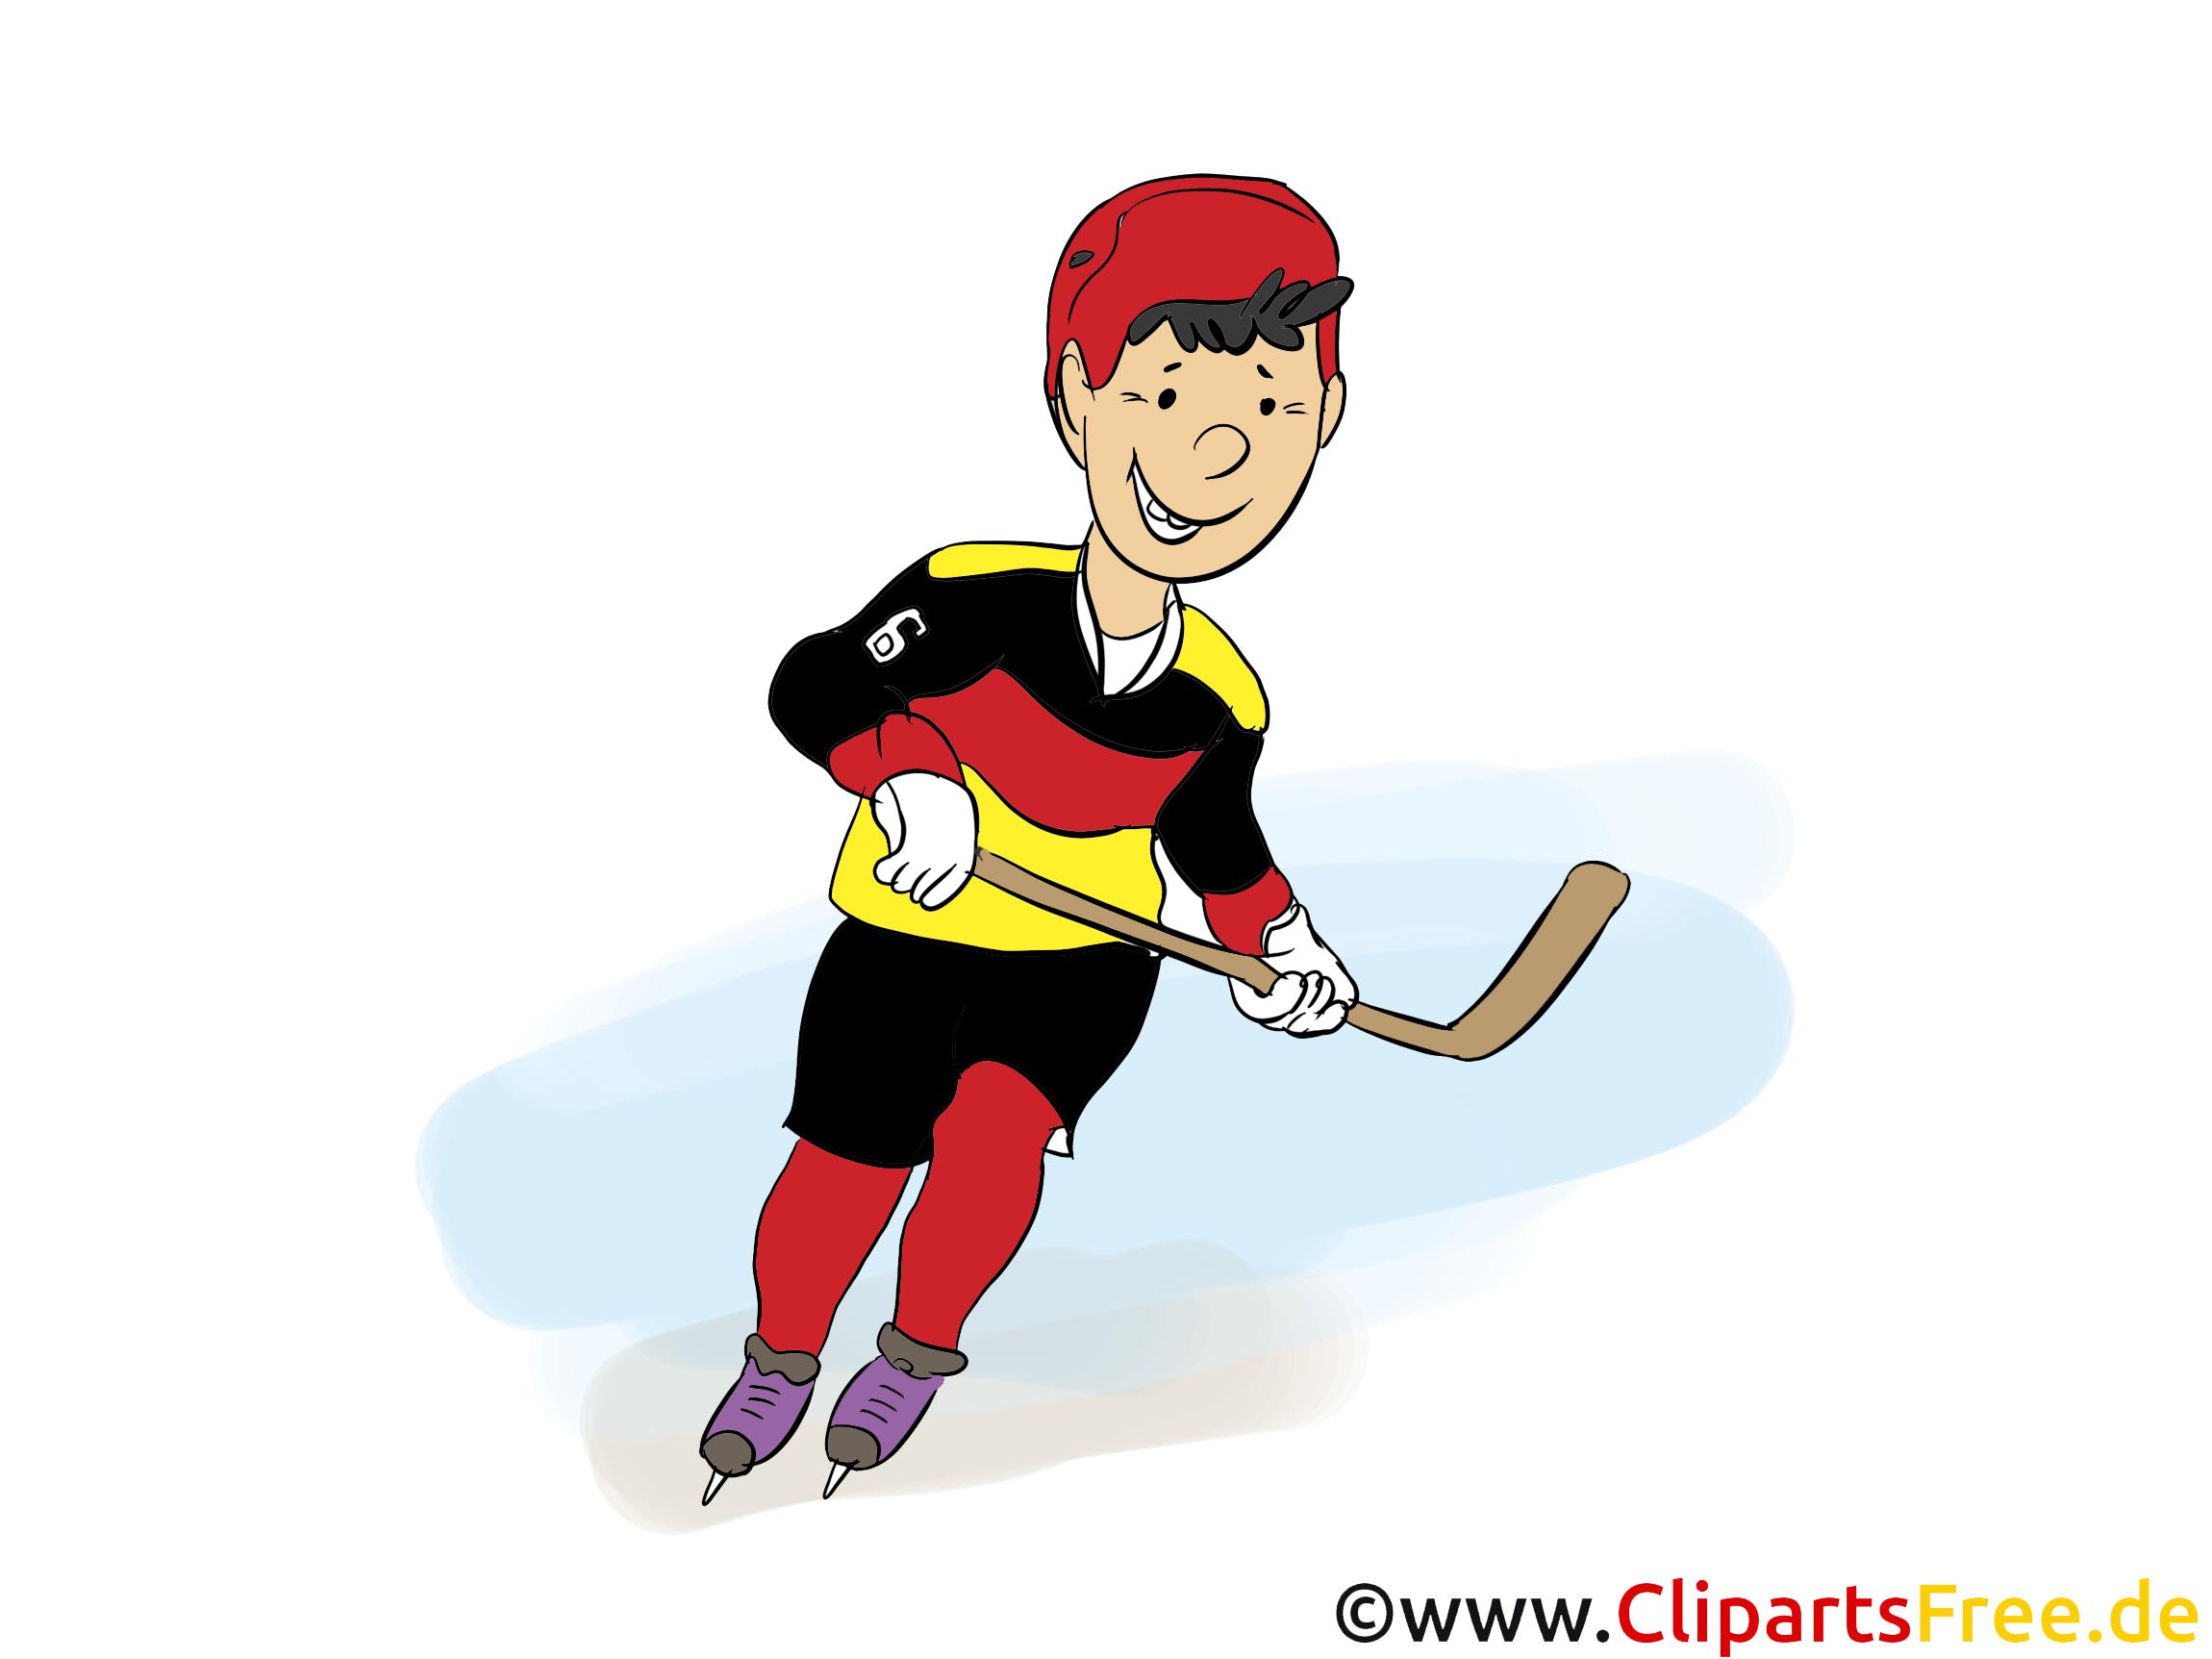 Ice hockey player clipart free